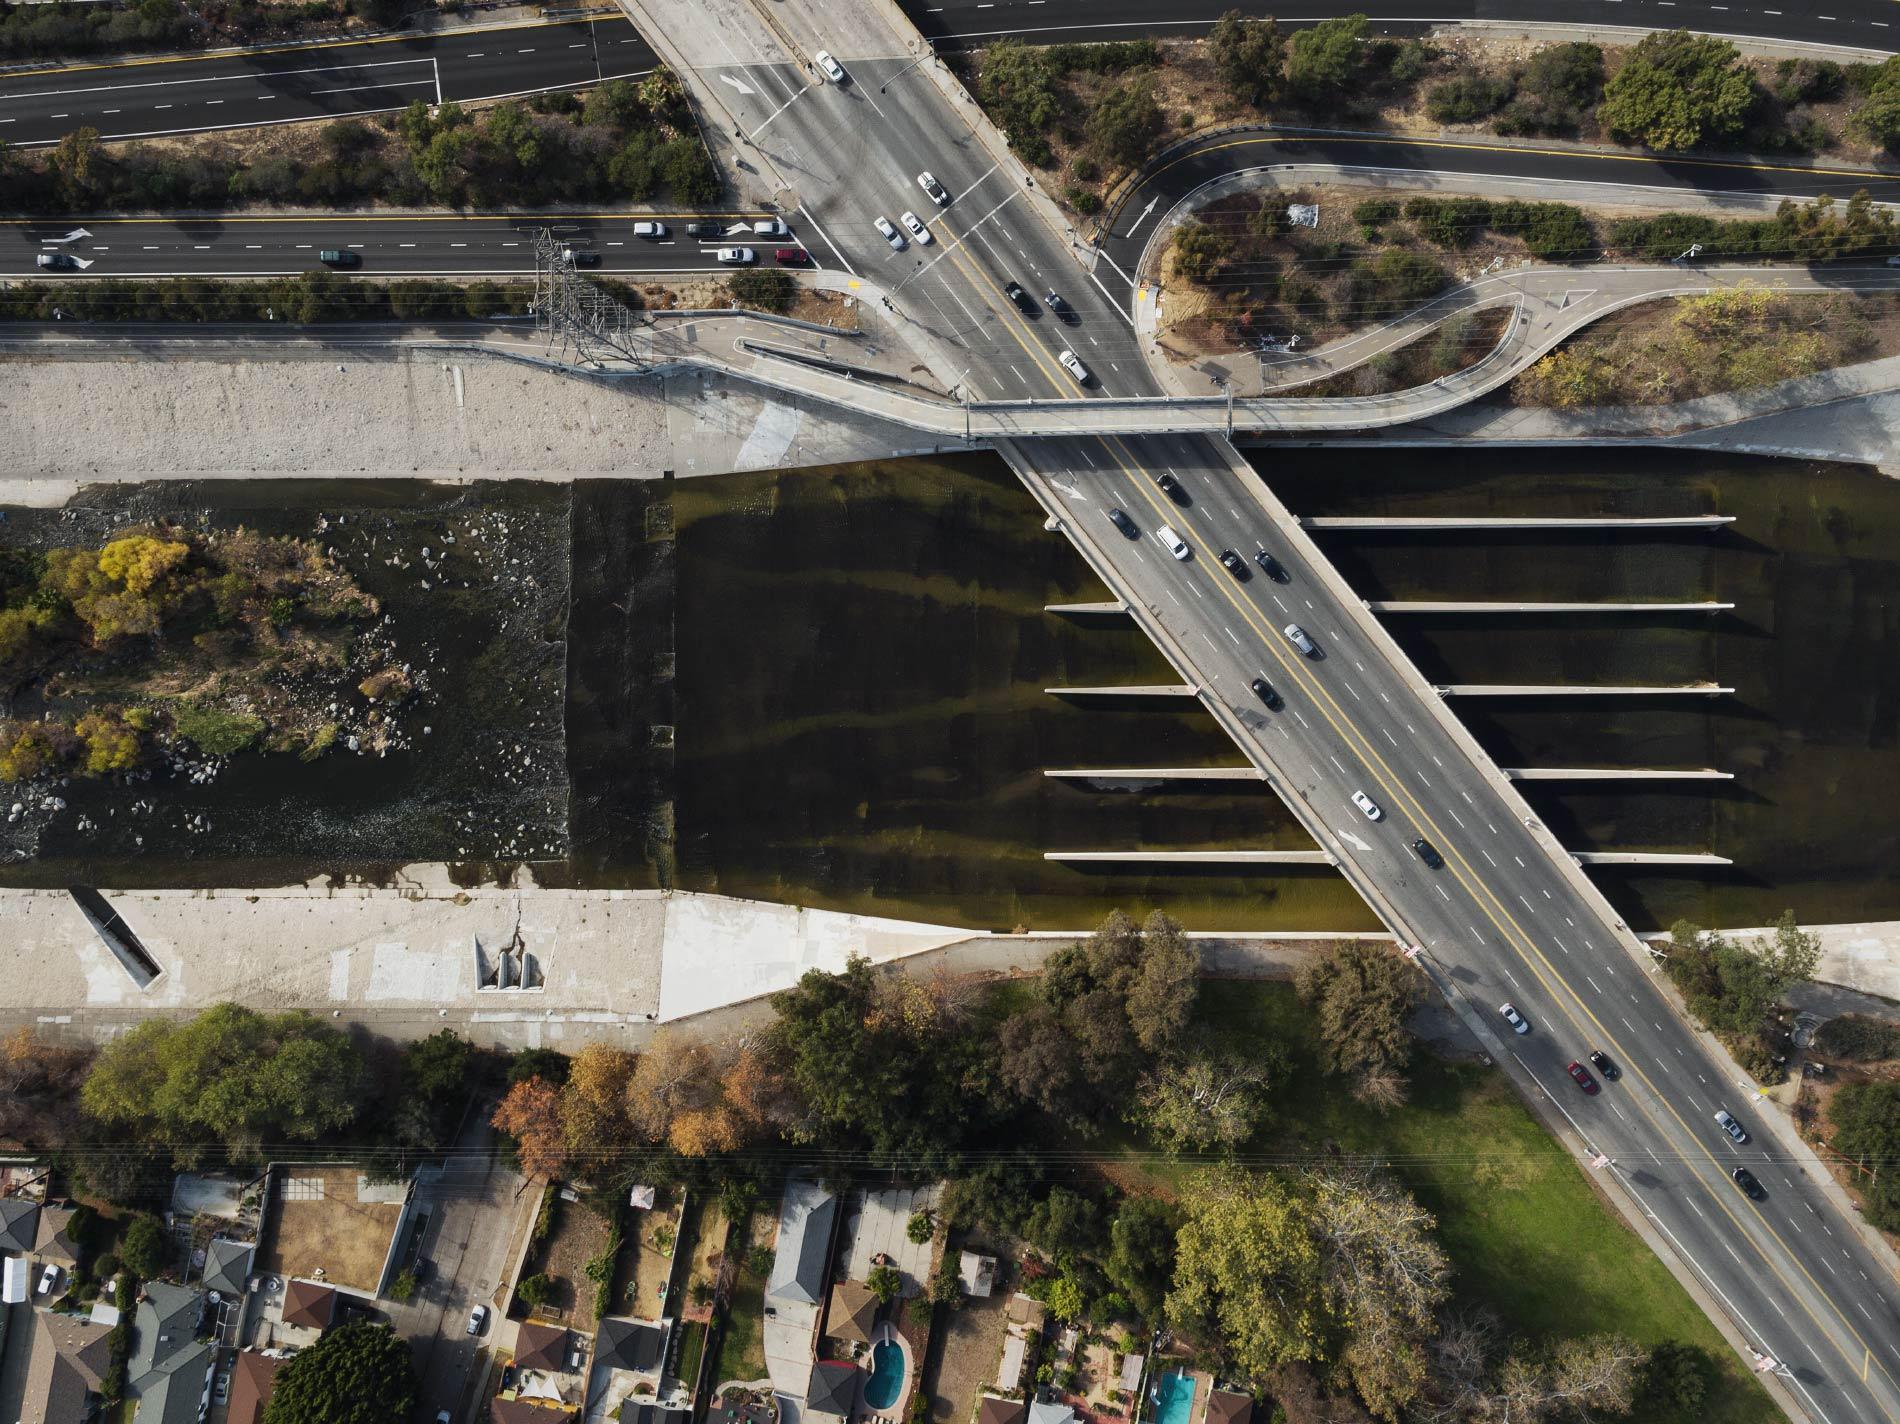 LA_River_drone_160102_02.jpg